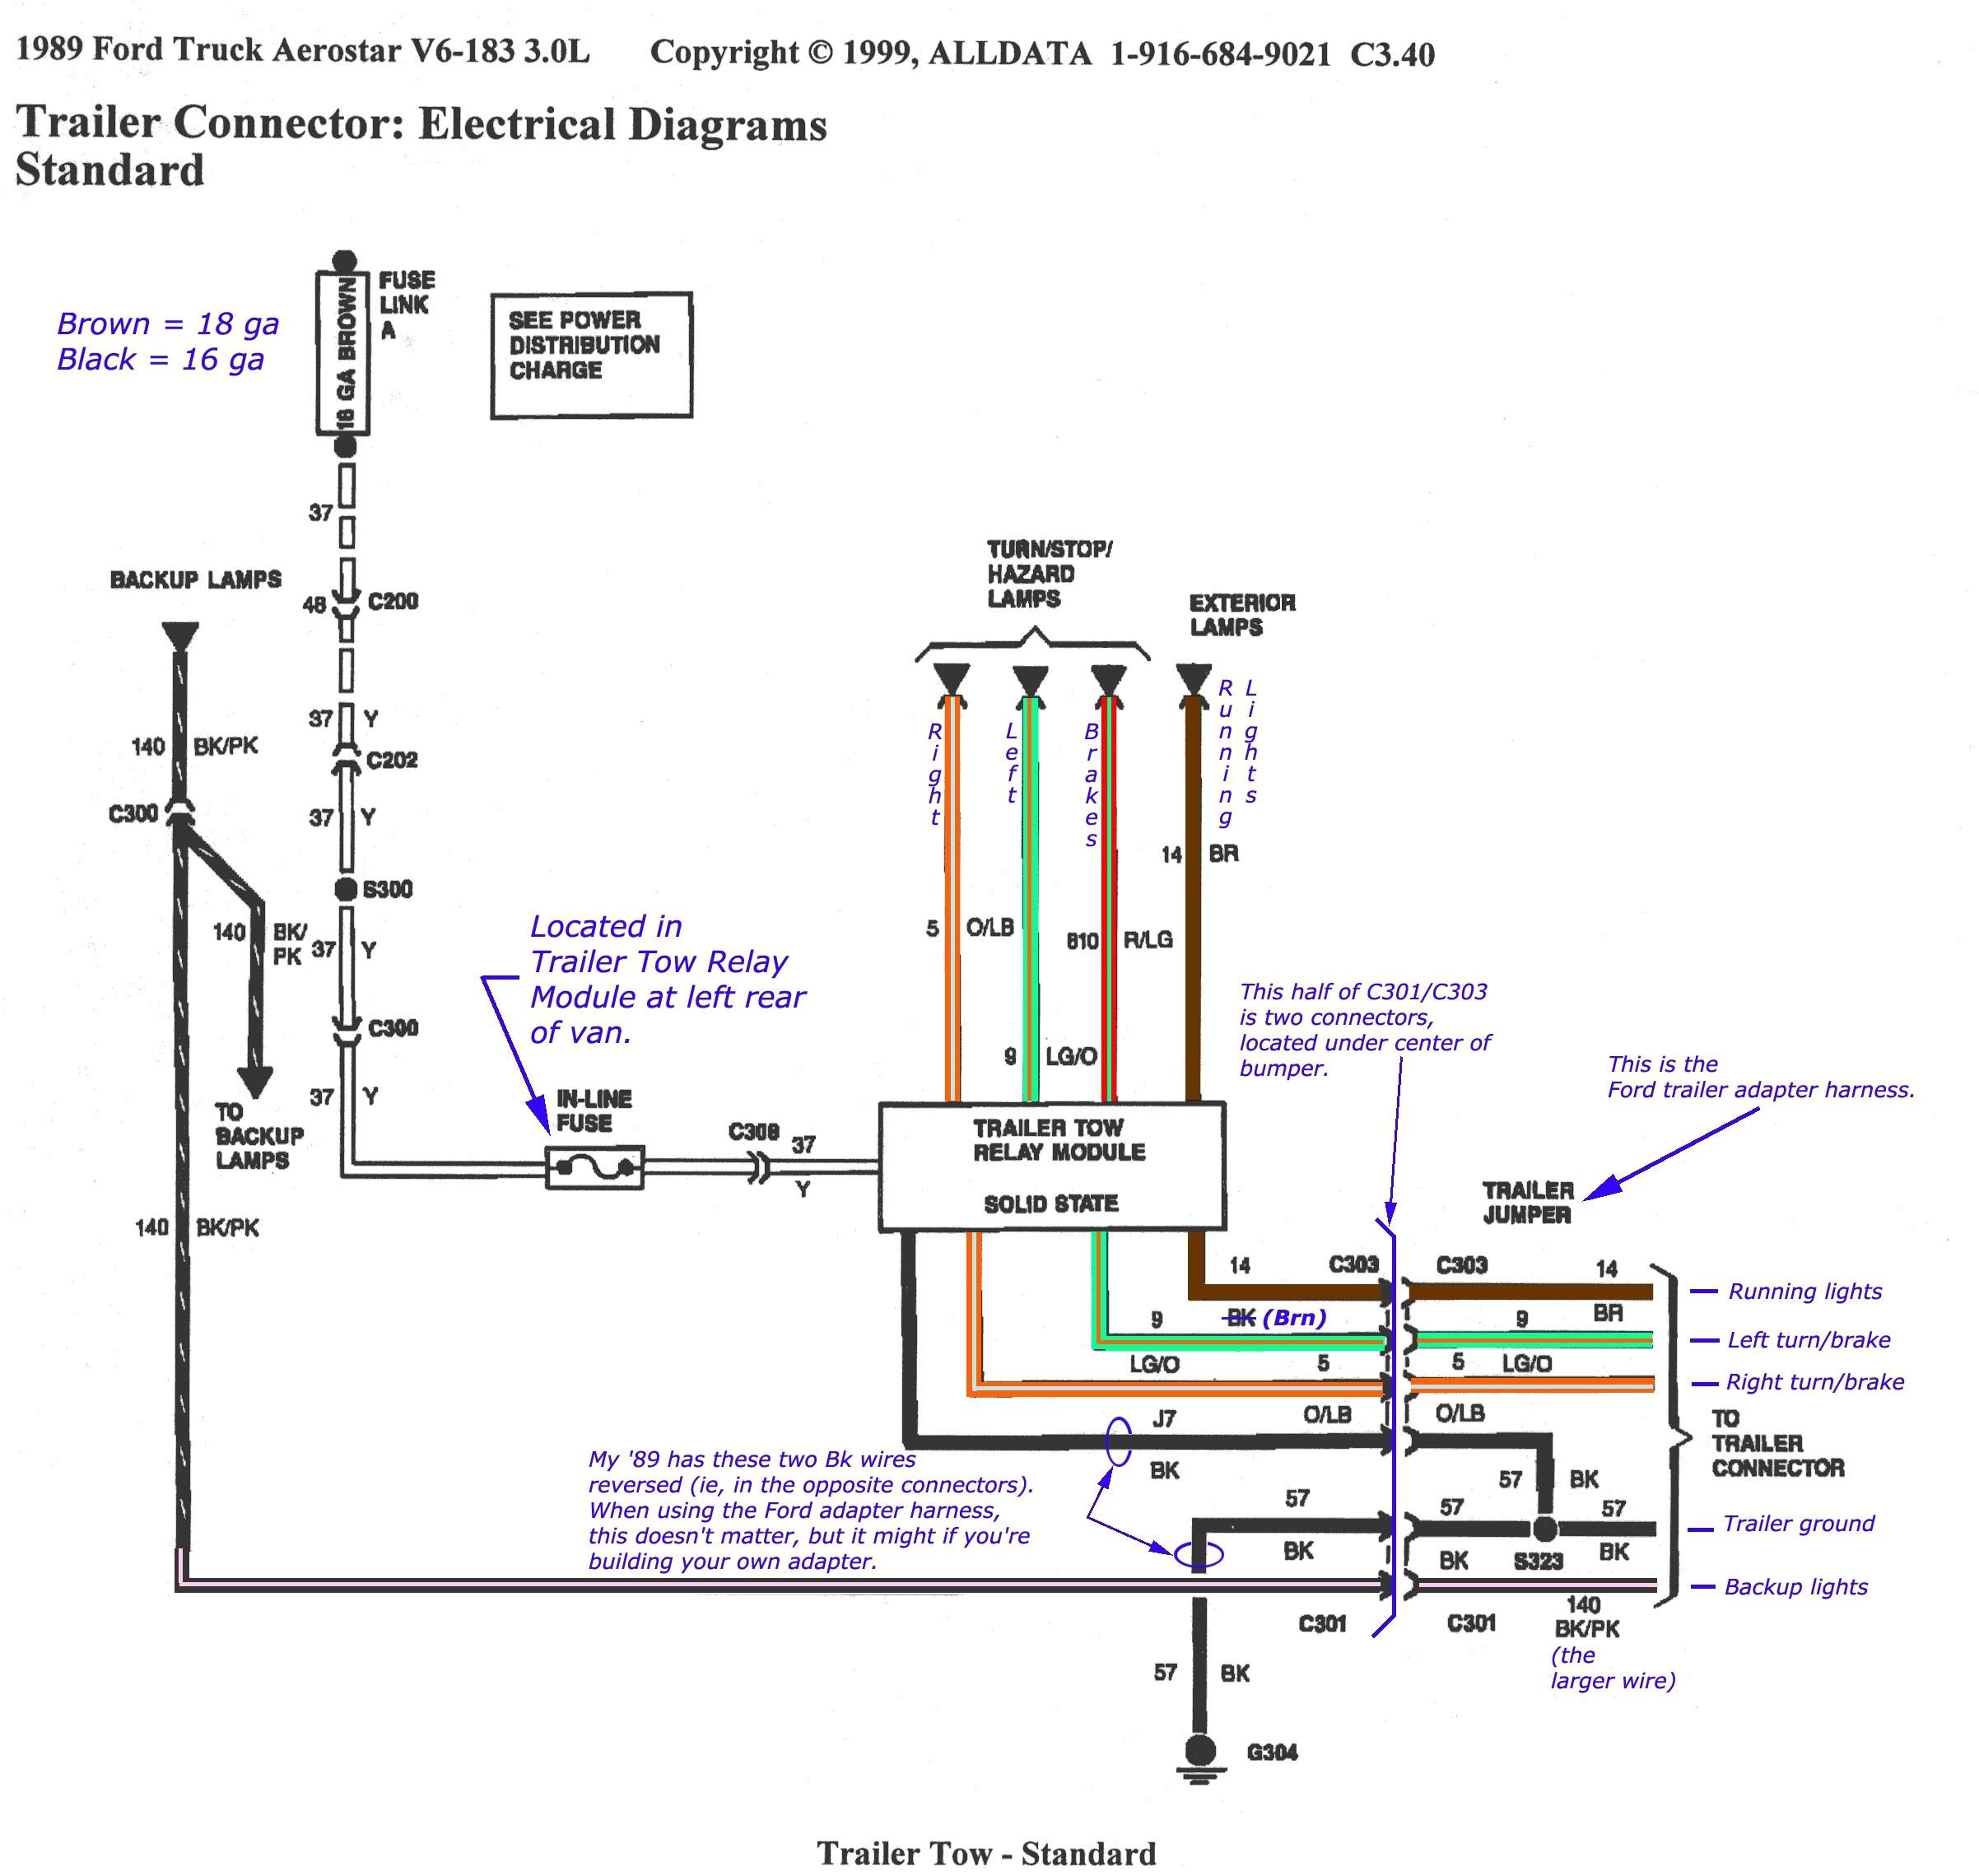 7 wire trailer diagram 2010 f150 wiring diagram expert 2010 f150 trailer connector wiring diagram data